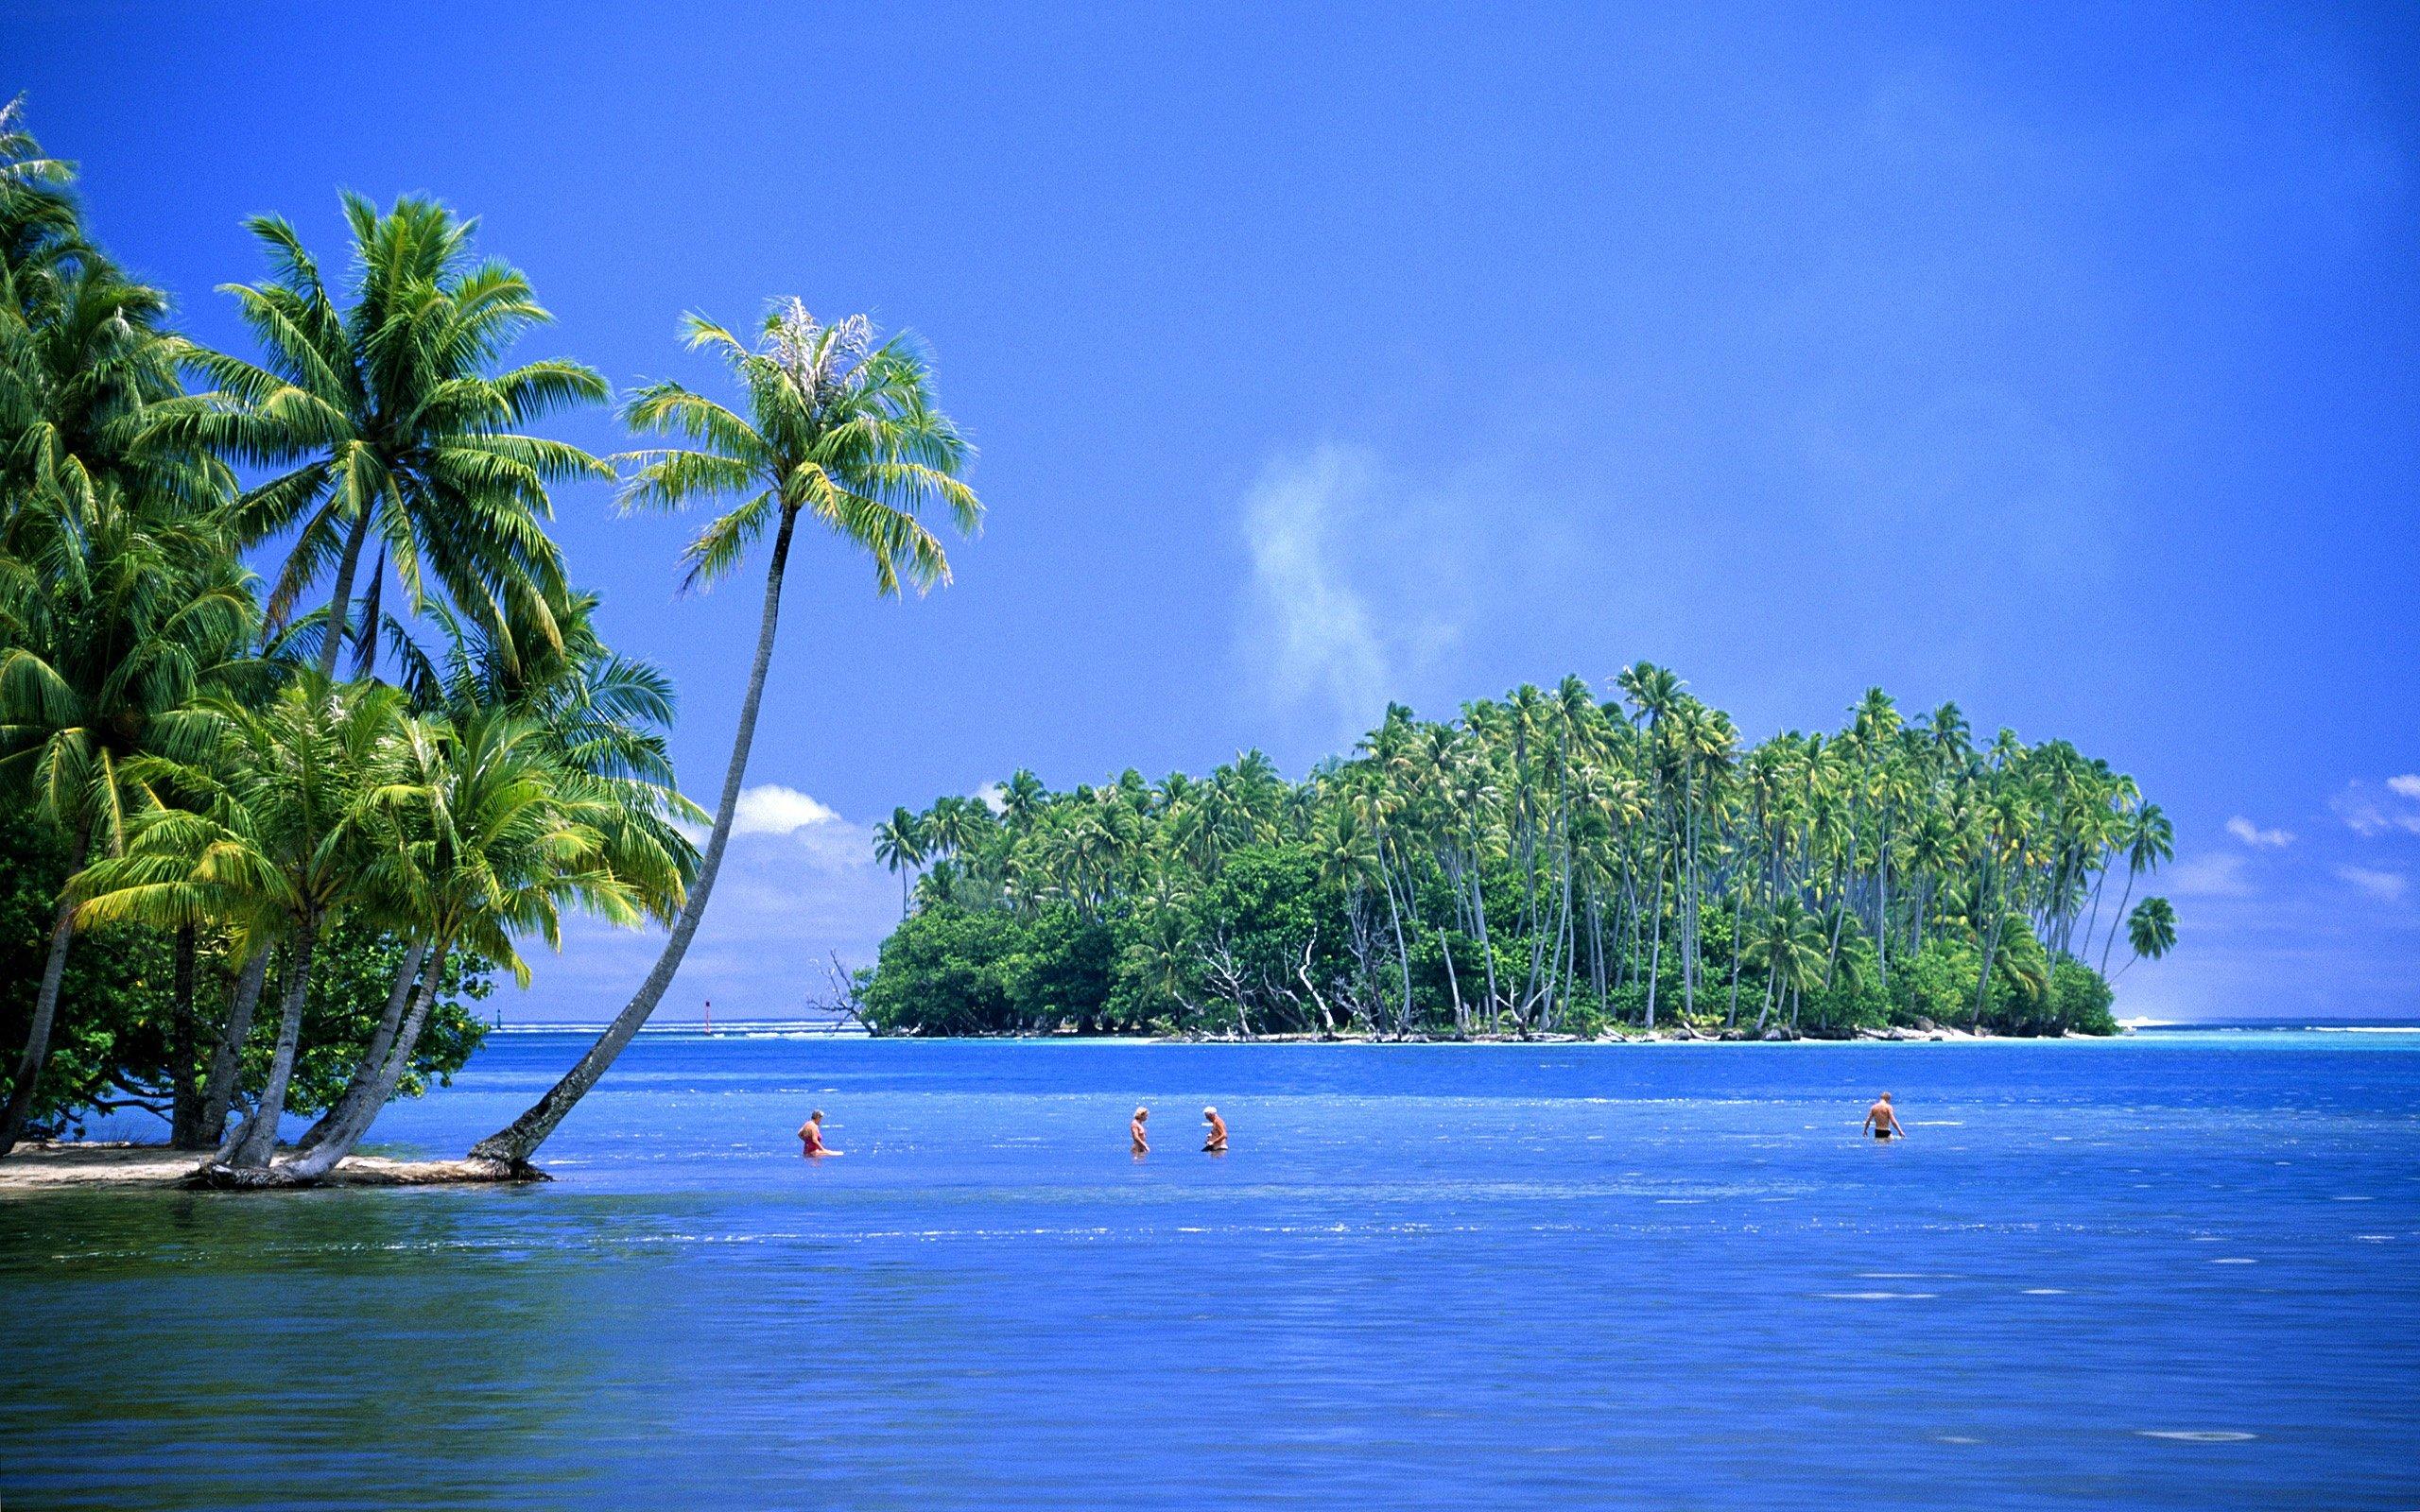 caribbean island hd wallpaper